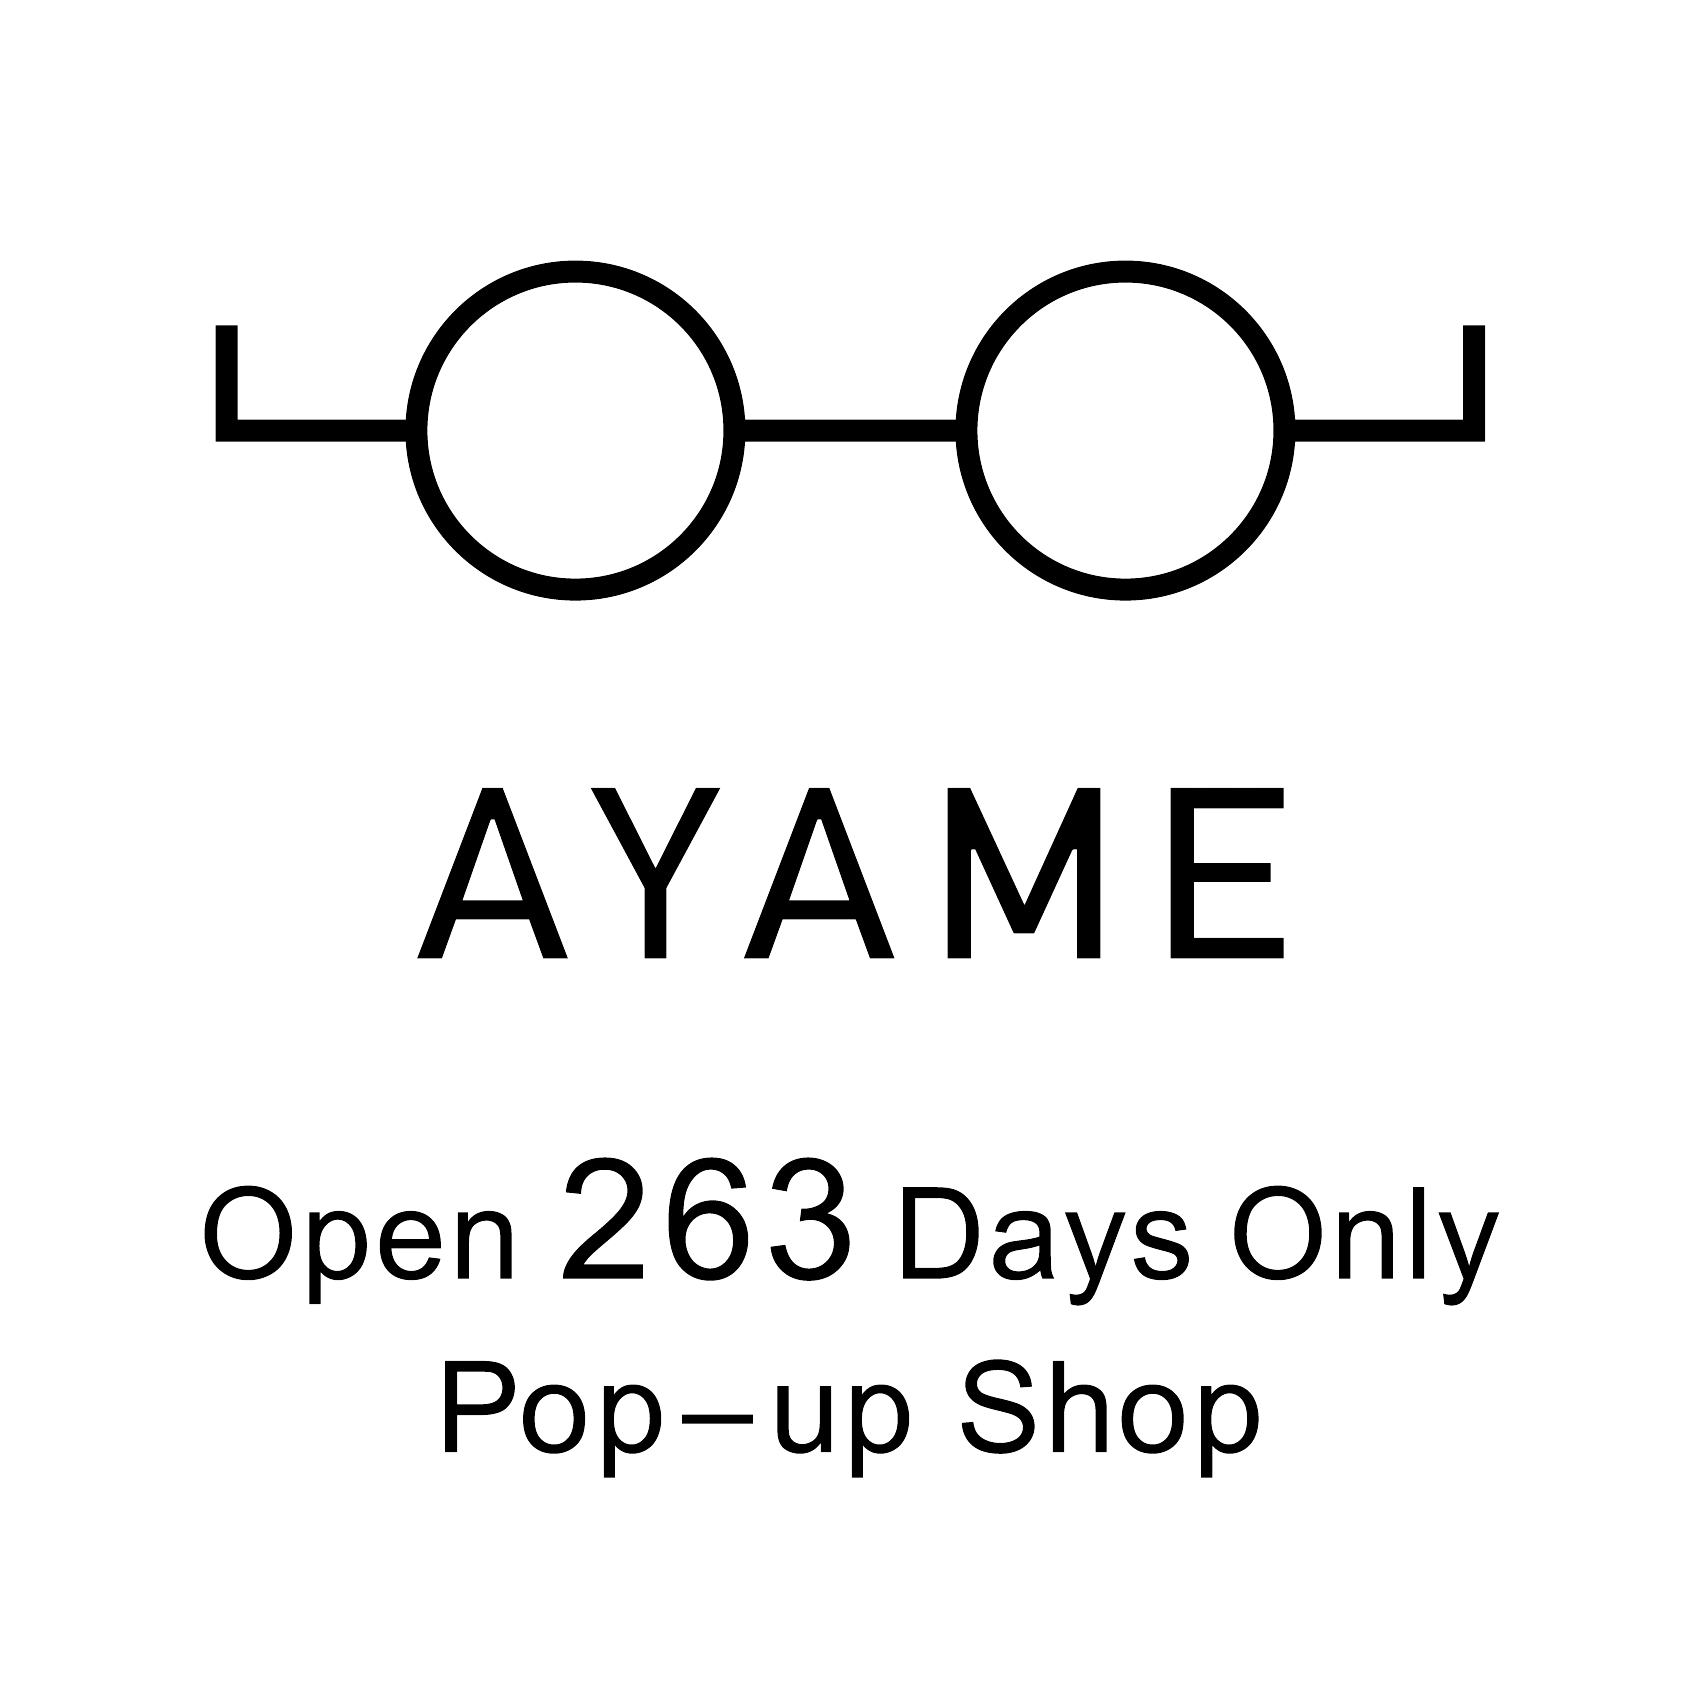 AYAME-SHOP-OPEN-bk.png